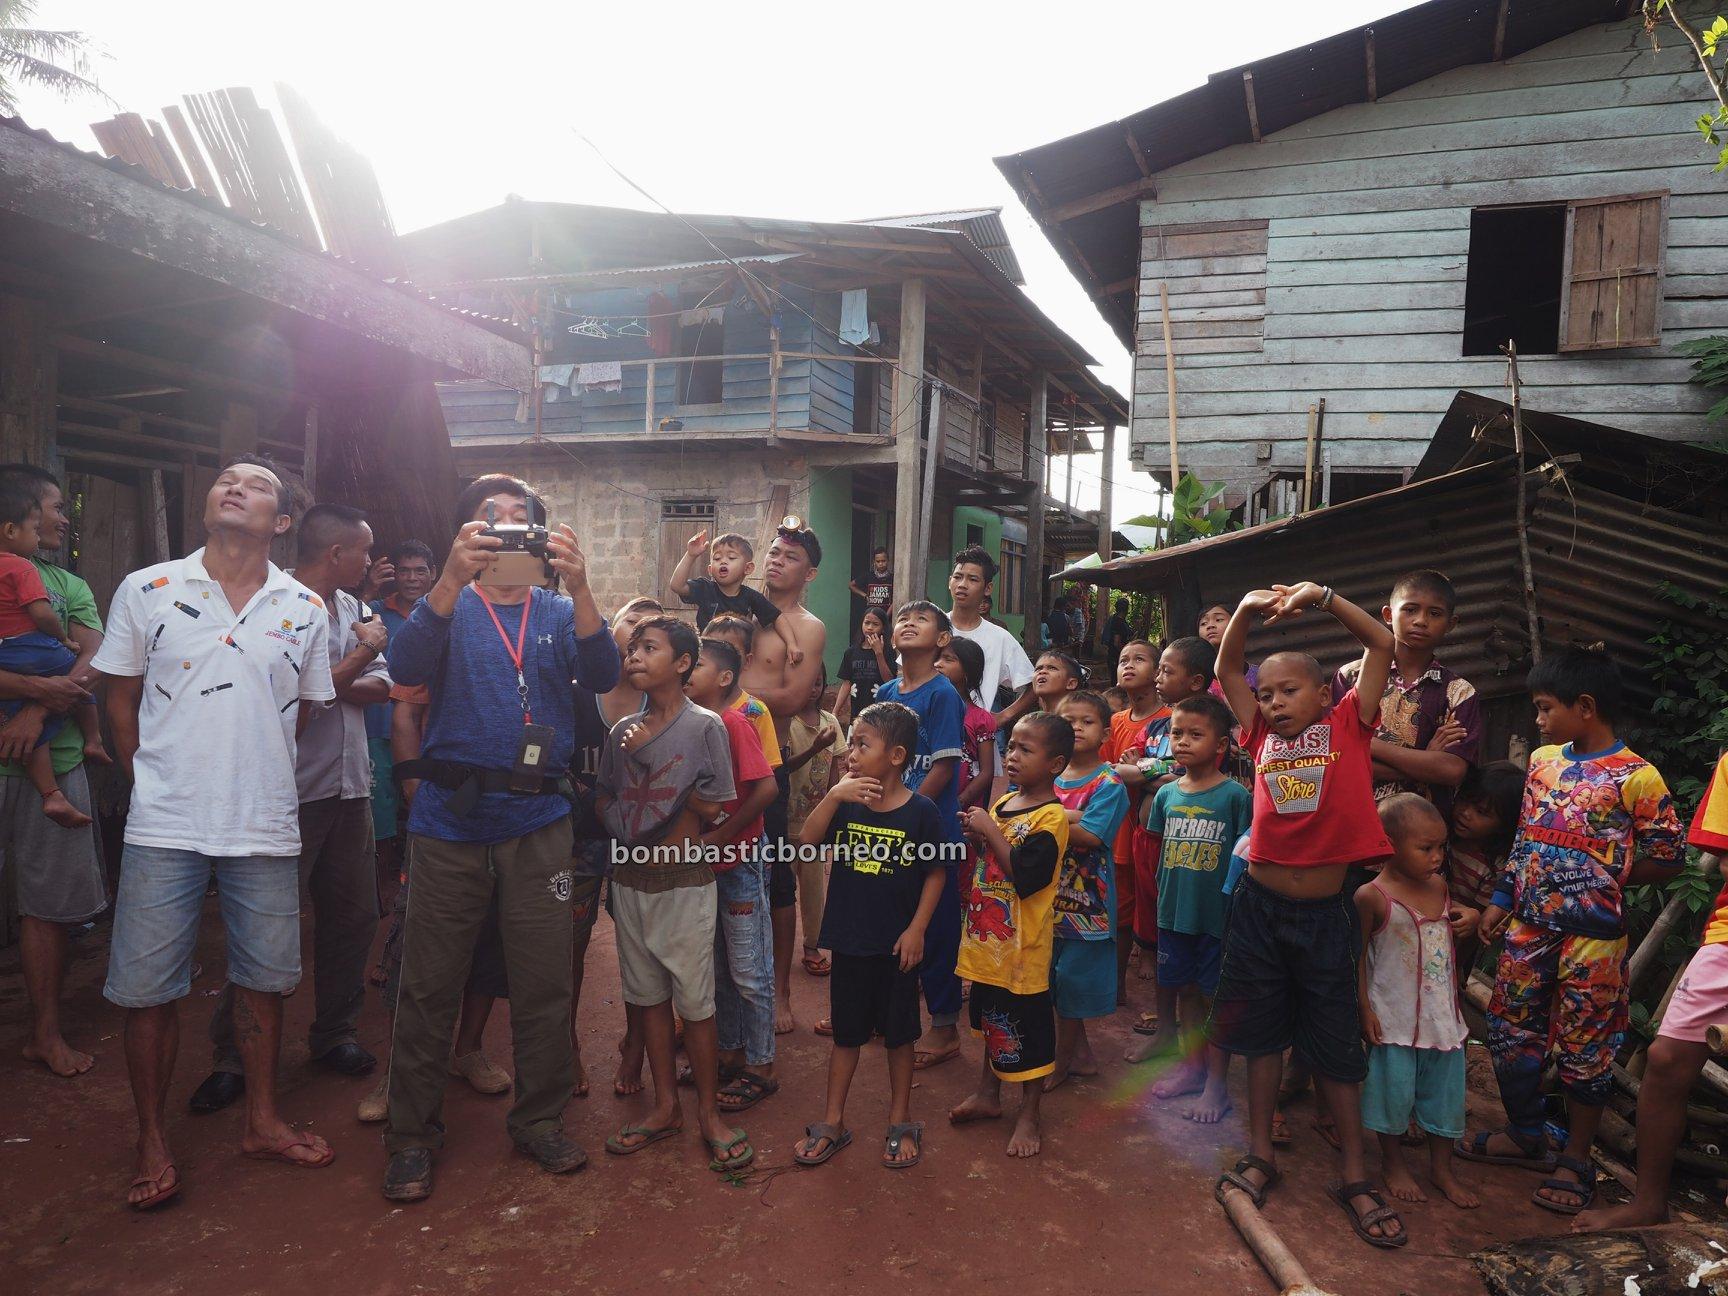 Dusun Tamong, authentic, Traditional, indigenous, backpackers, Gawai Padi, Siding, ethnic, native, Dayak Bidayuh, Tourism, travel guide, cross border, 婆罗洲达雅部落, 印尼西加里曼丹,